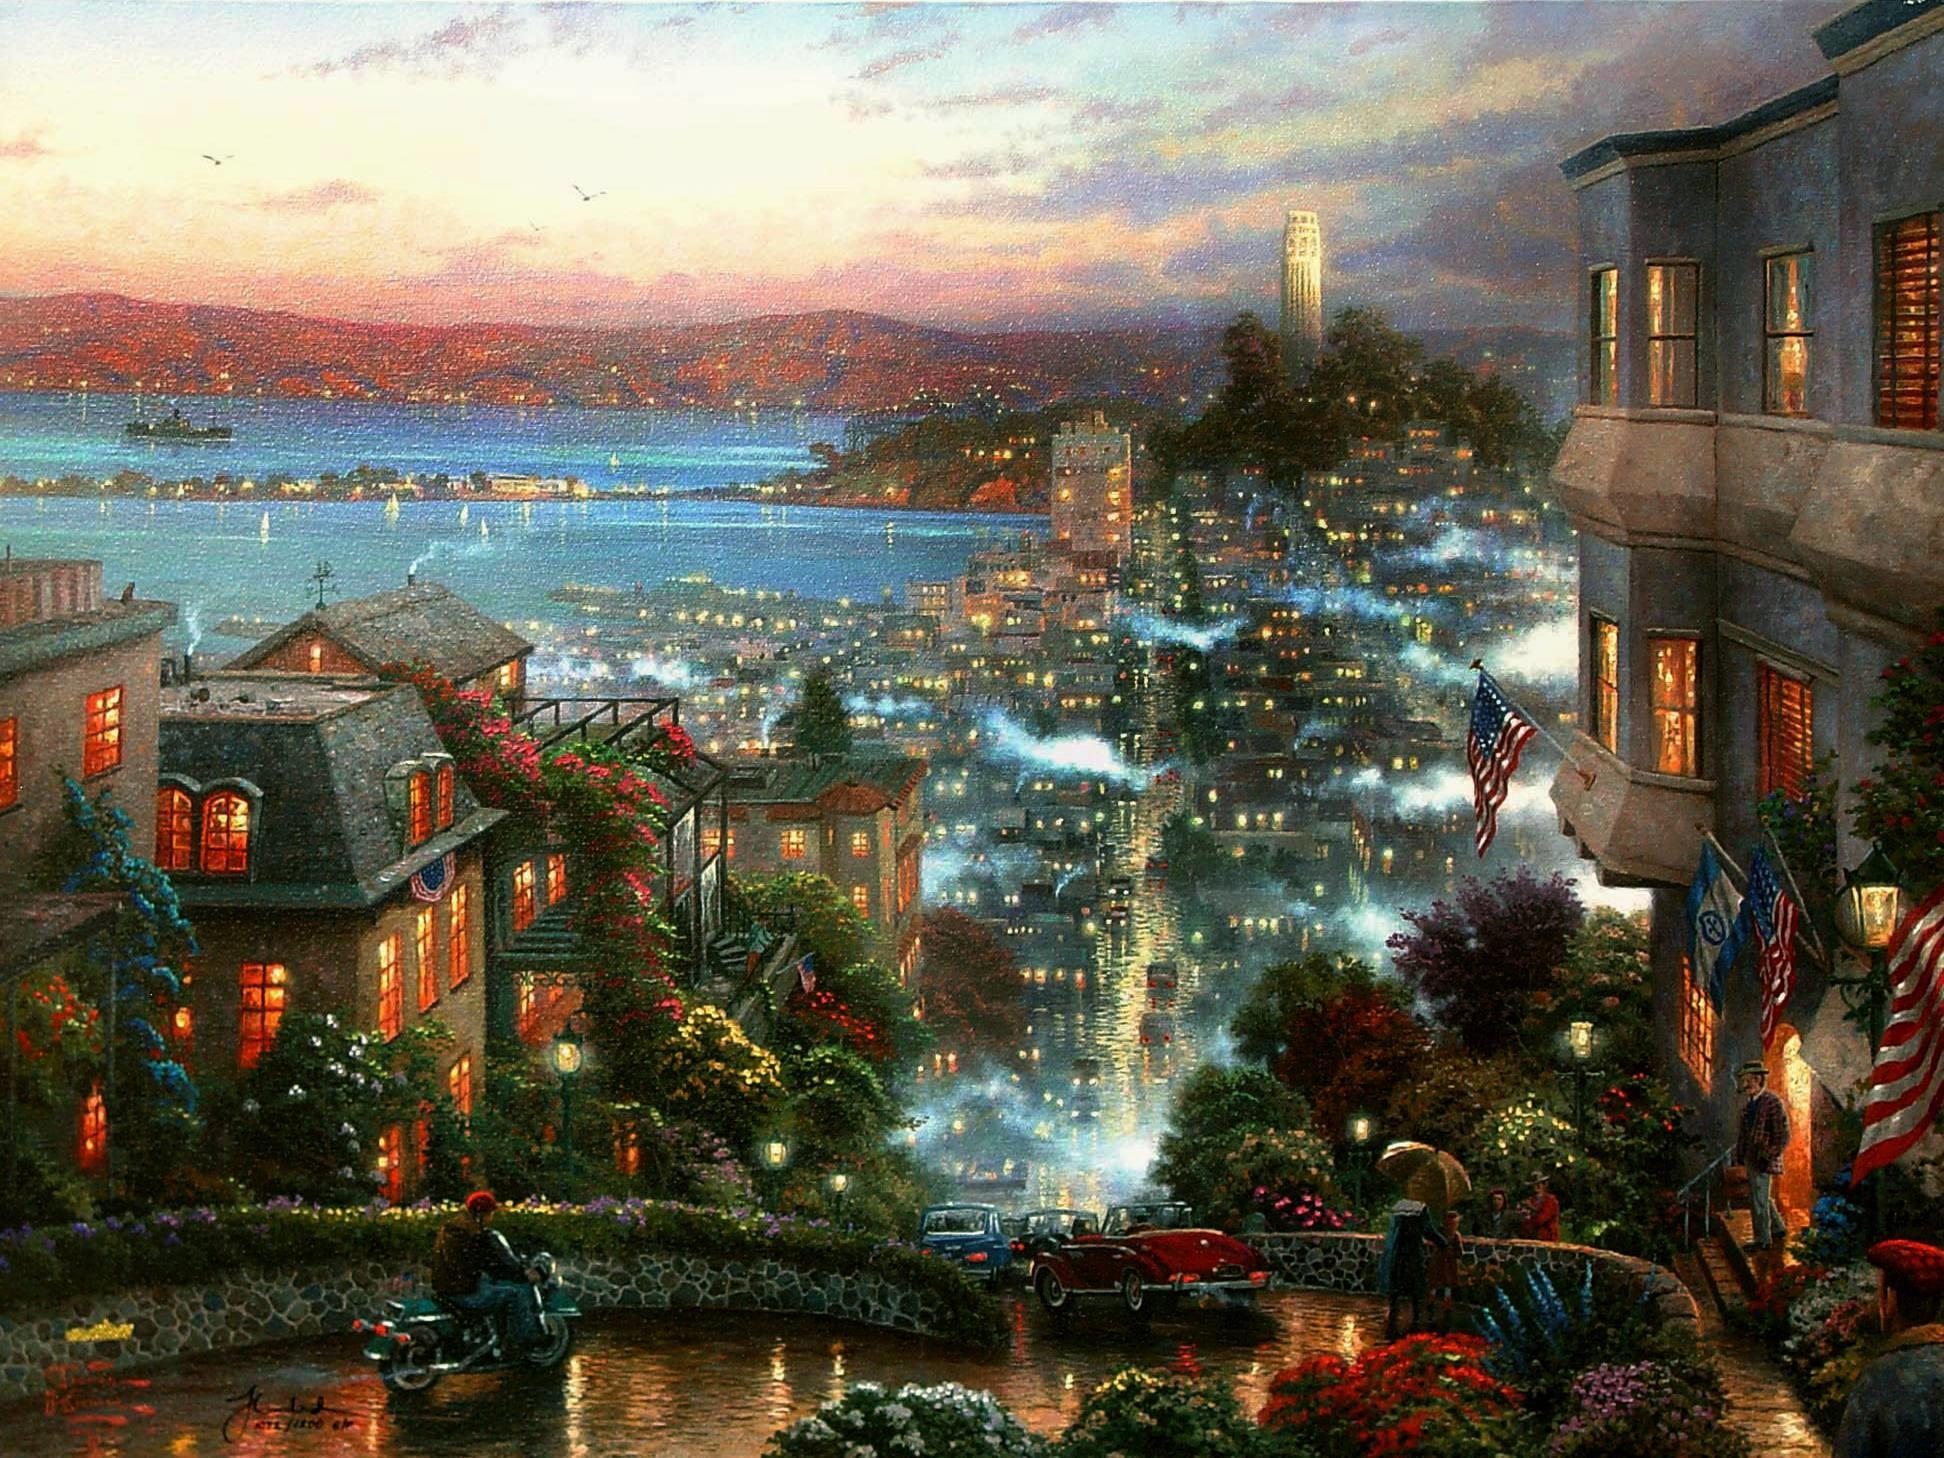 https://data12.gallery.ru/albums/gallery/5657-ac6e3-34423556-.jpg | San  Francisco ~ The City by the Bay | Pinterest | Thomas kinkade and San  francisco